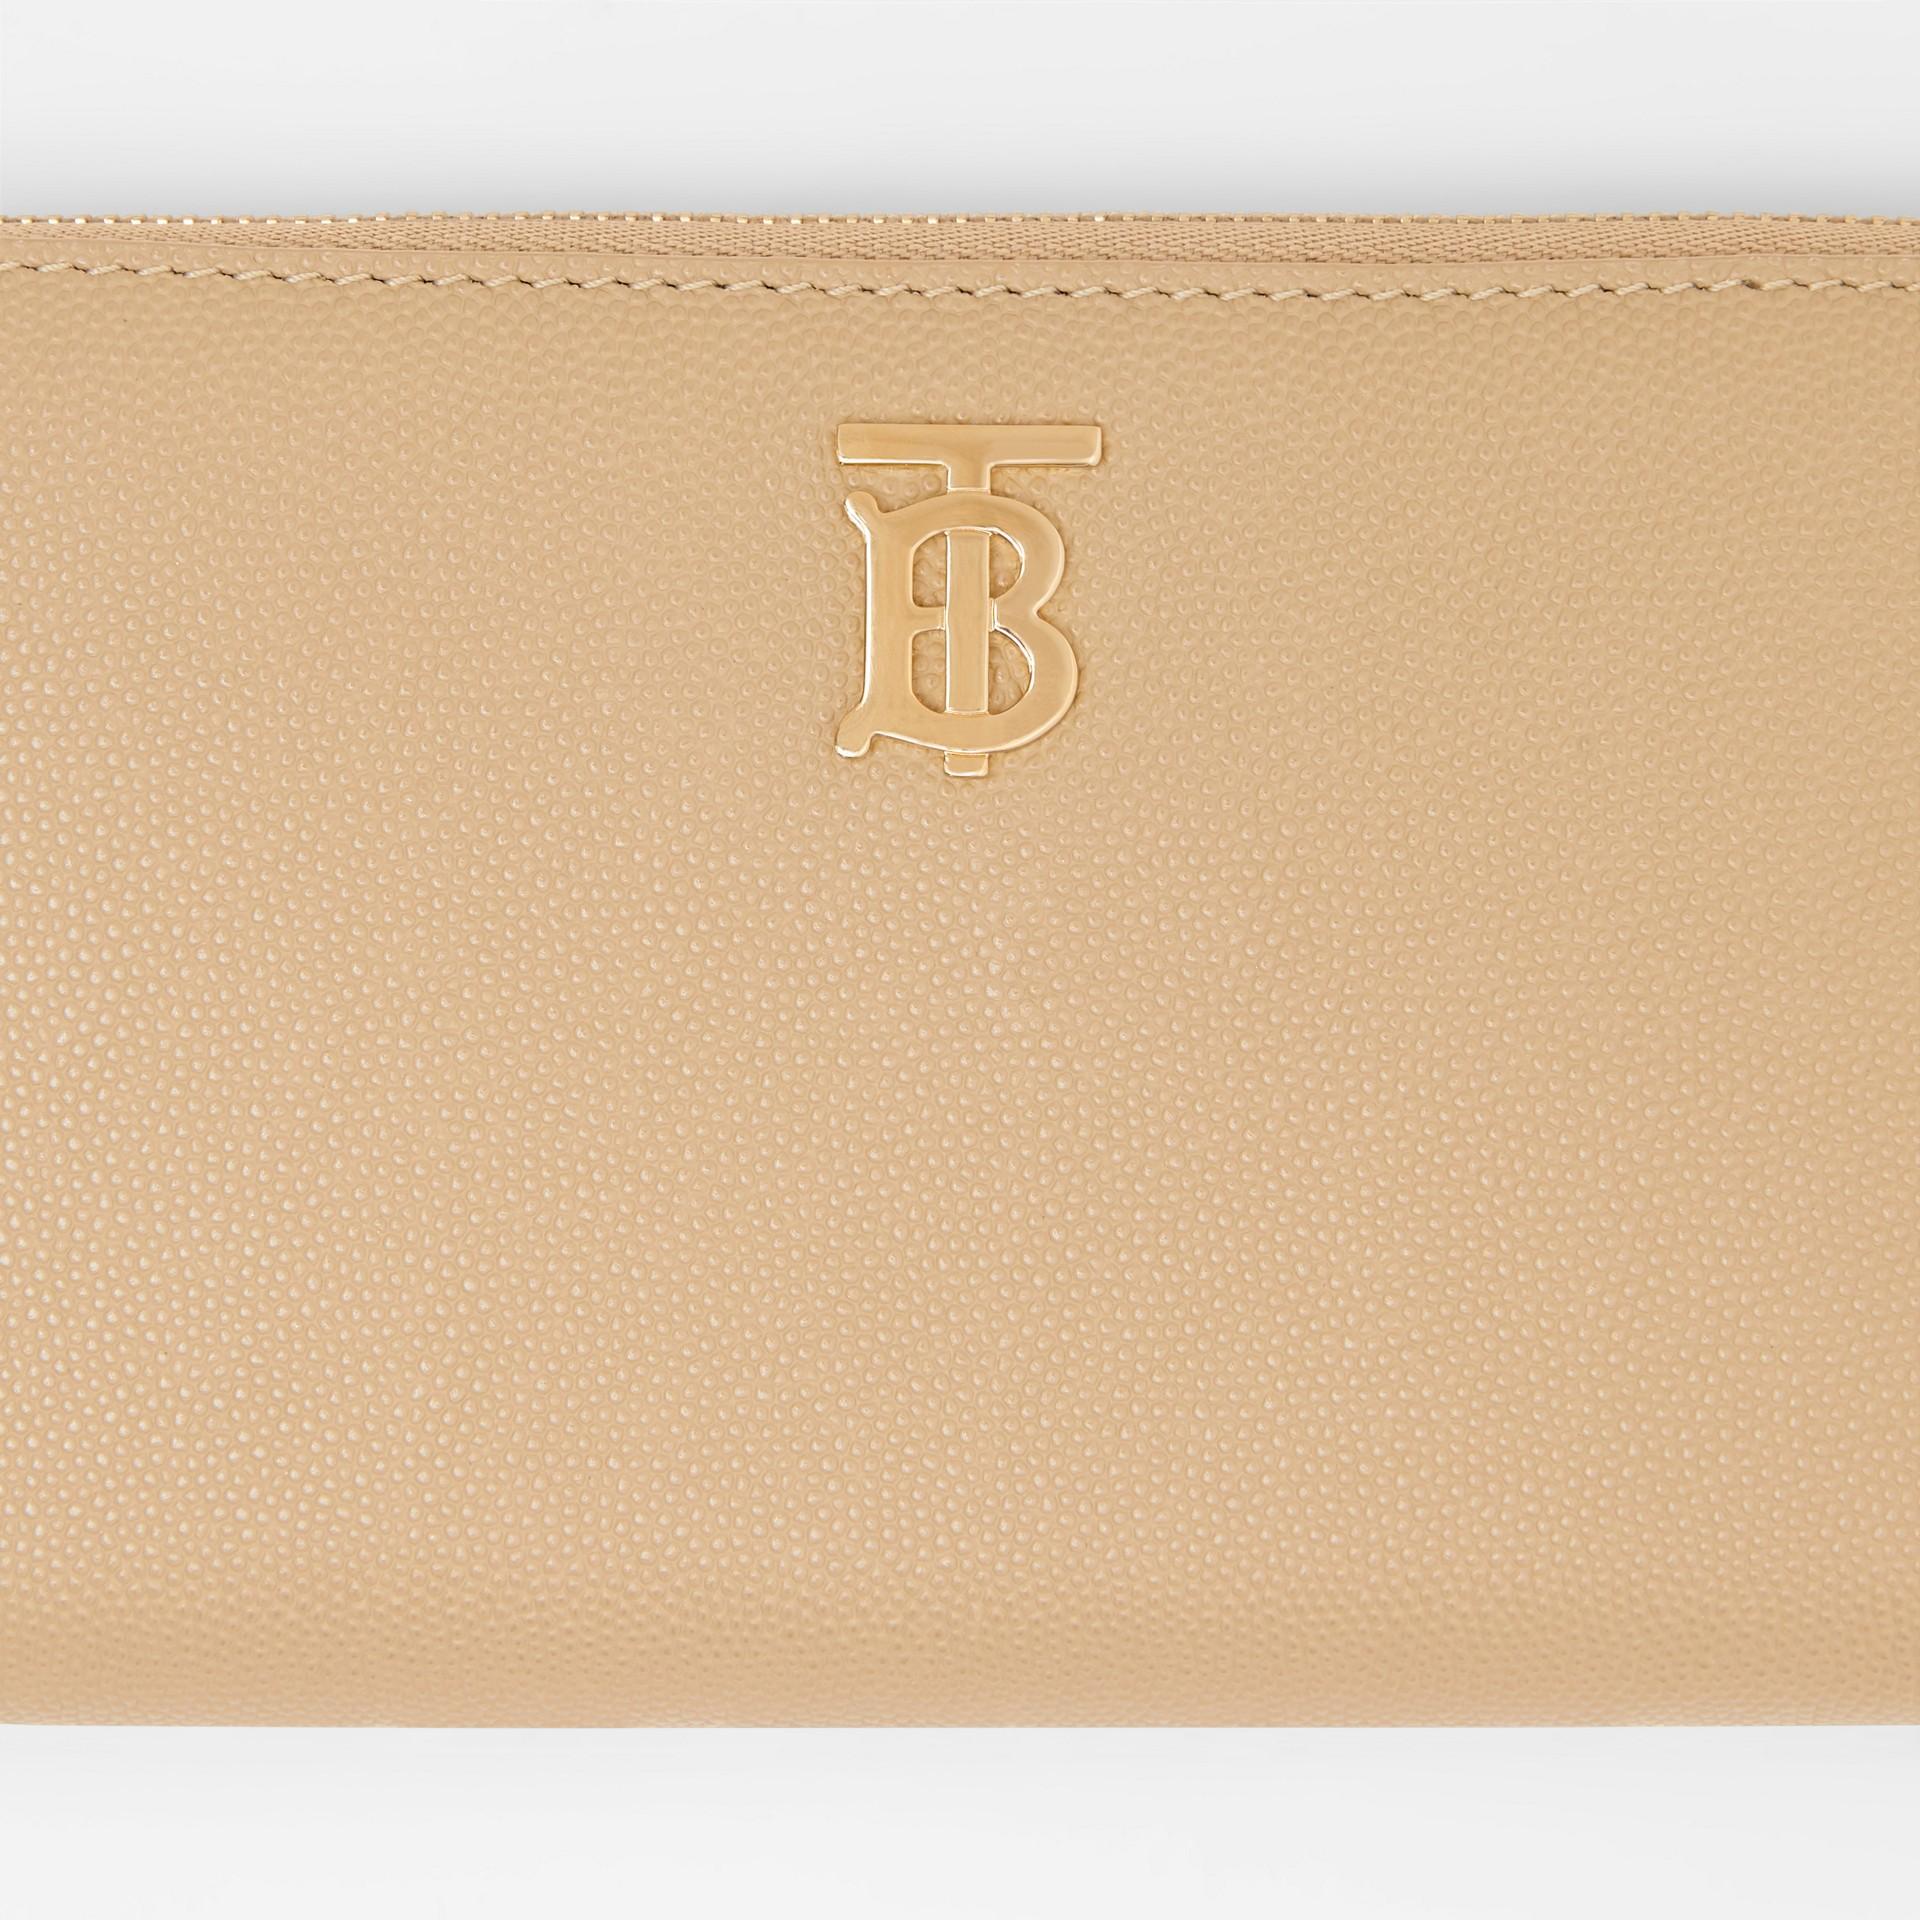 Monogram Motif Grainy Leather Ziparound Wallet in Archive Beige - Women | Burberry United Kingdom - gallery image 1